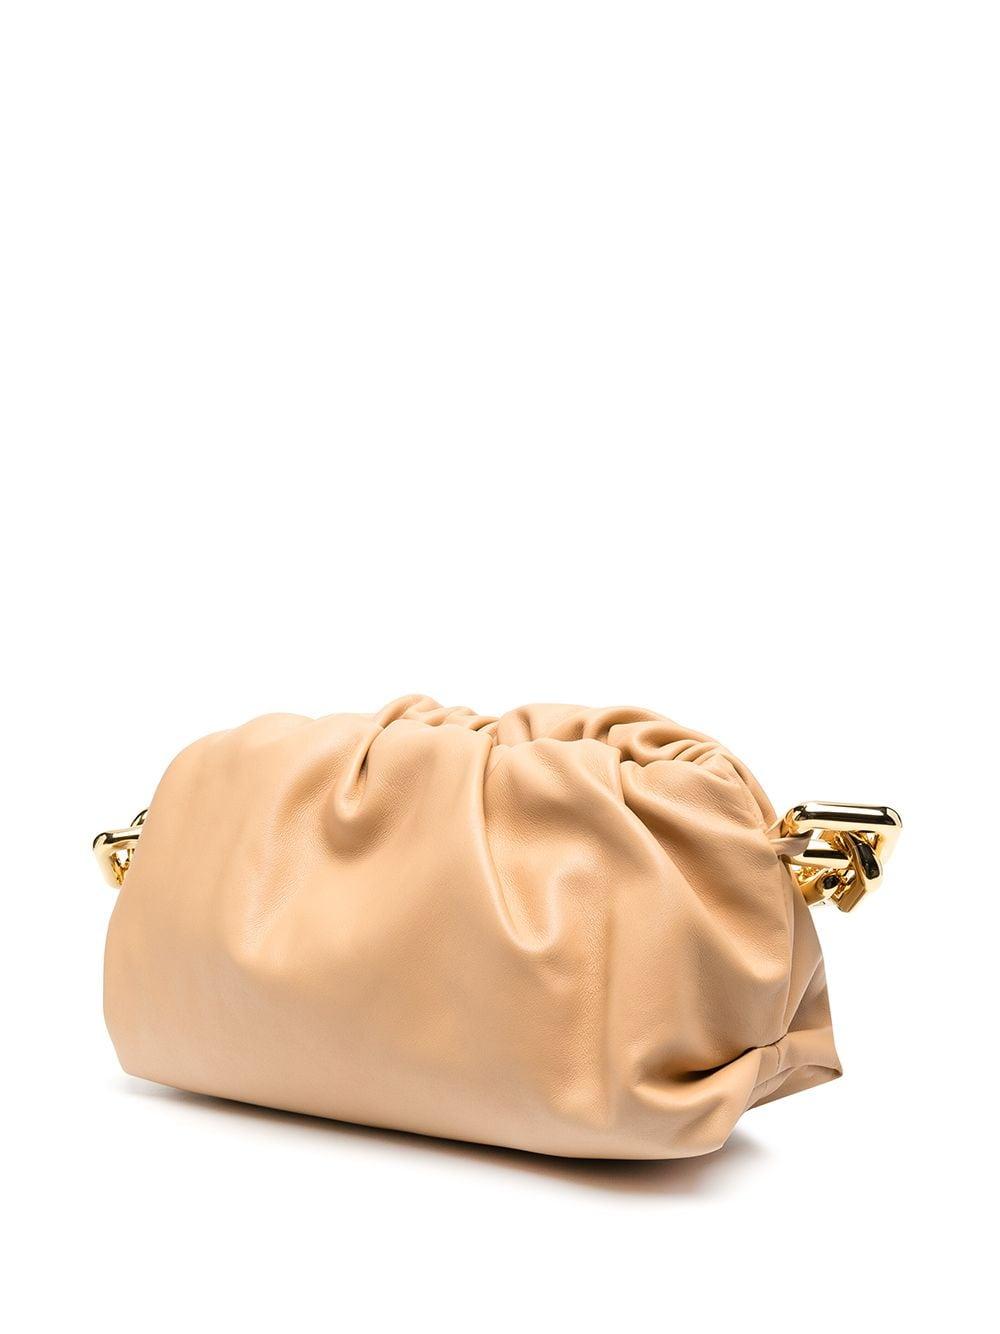 Picture of Bottega Veneta   The Chain Pouch Shoulder Bag